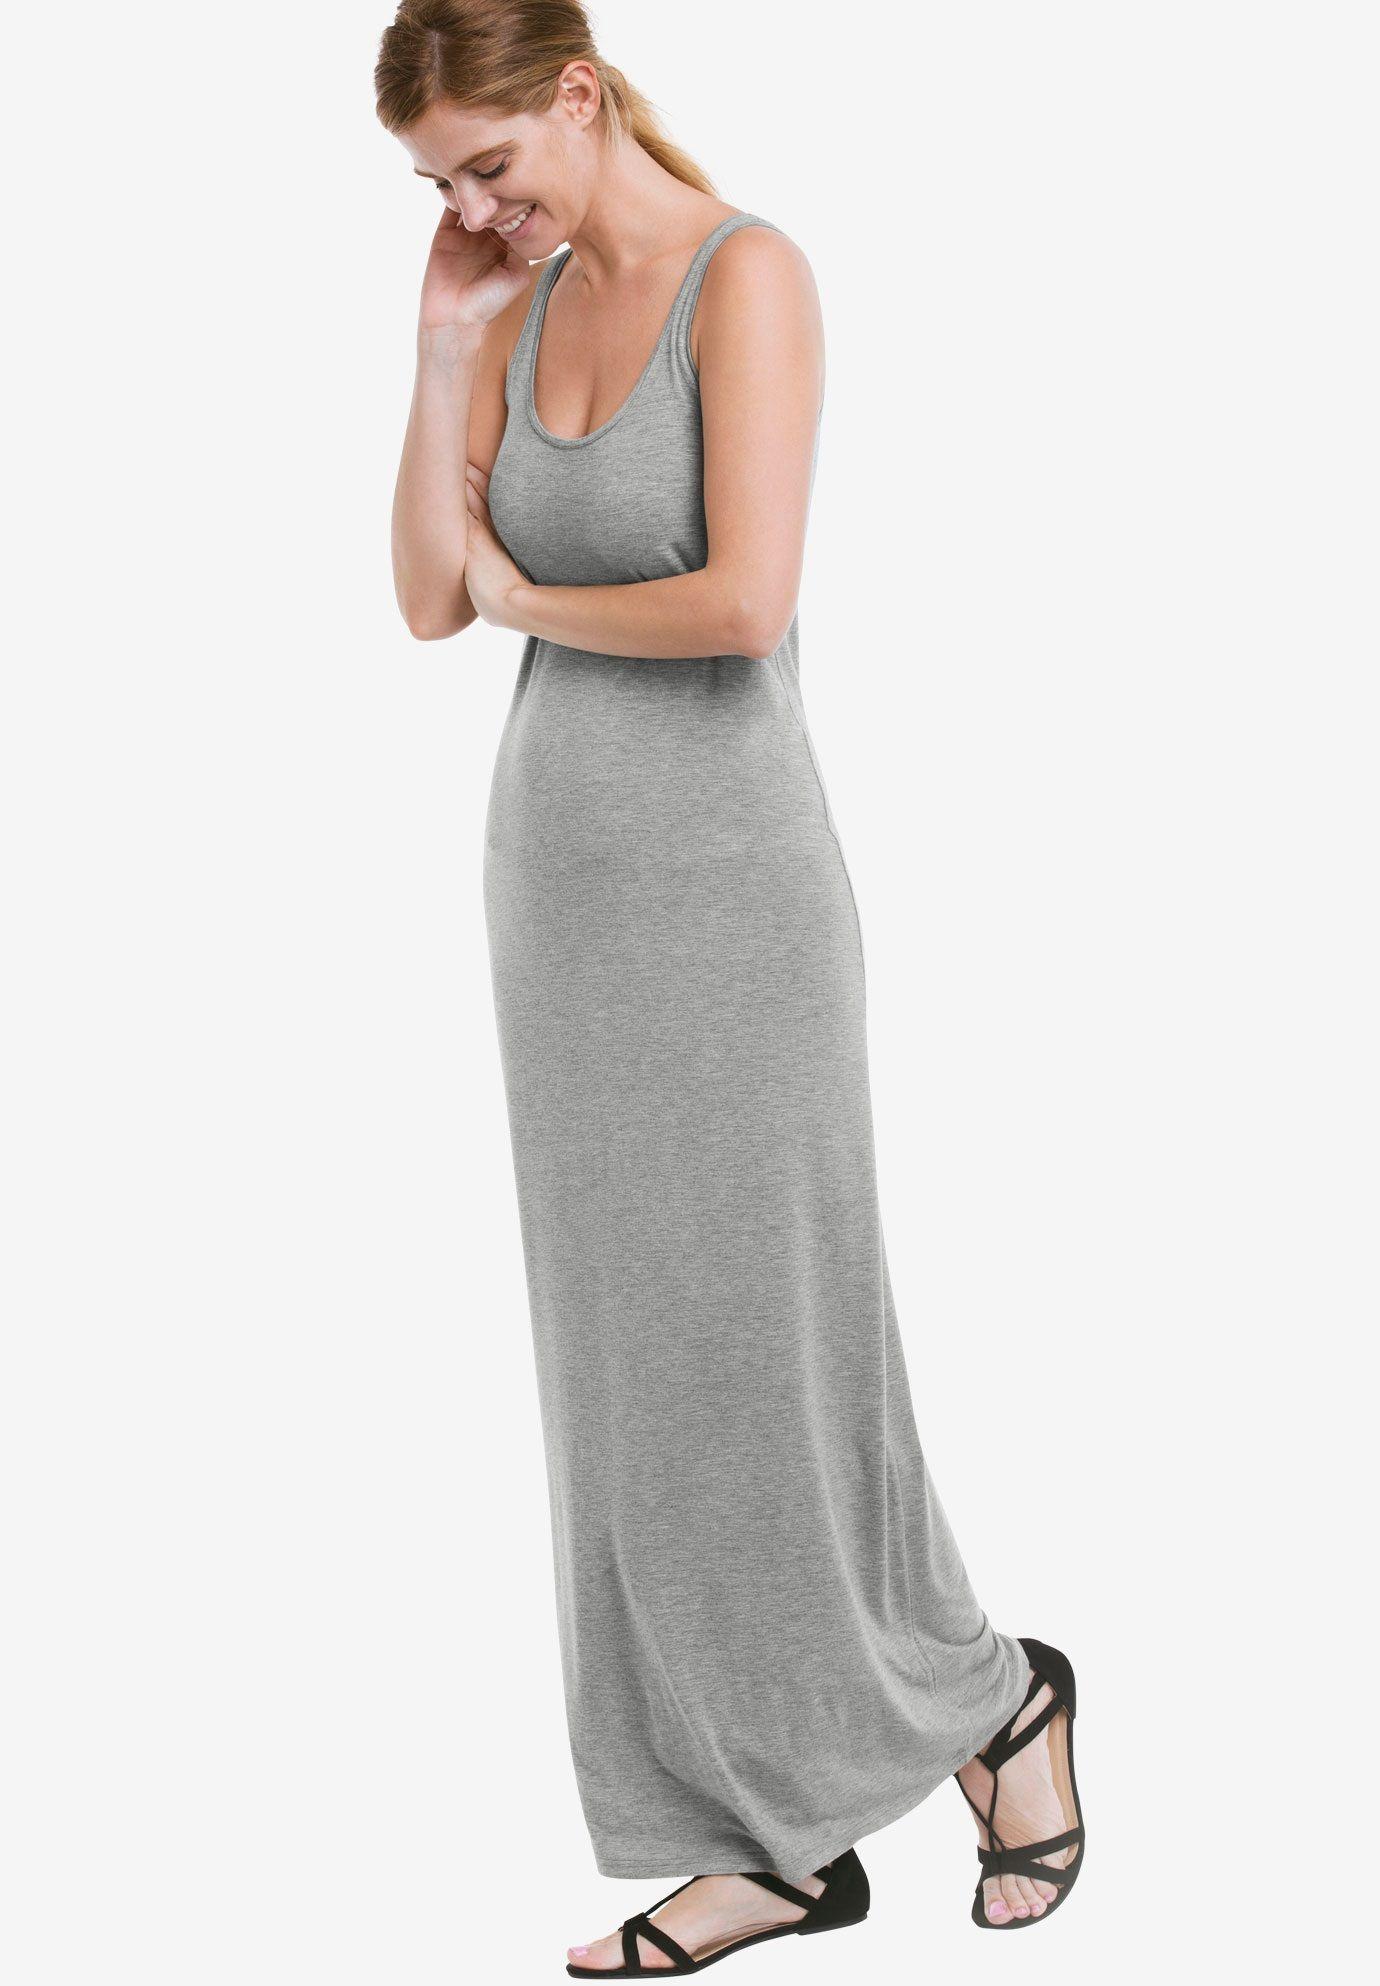 b71f7fdbada43 Sleeveless Knit Maxi Dress by ellos - Women s Plus Size Clothing ...